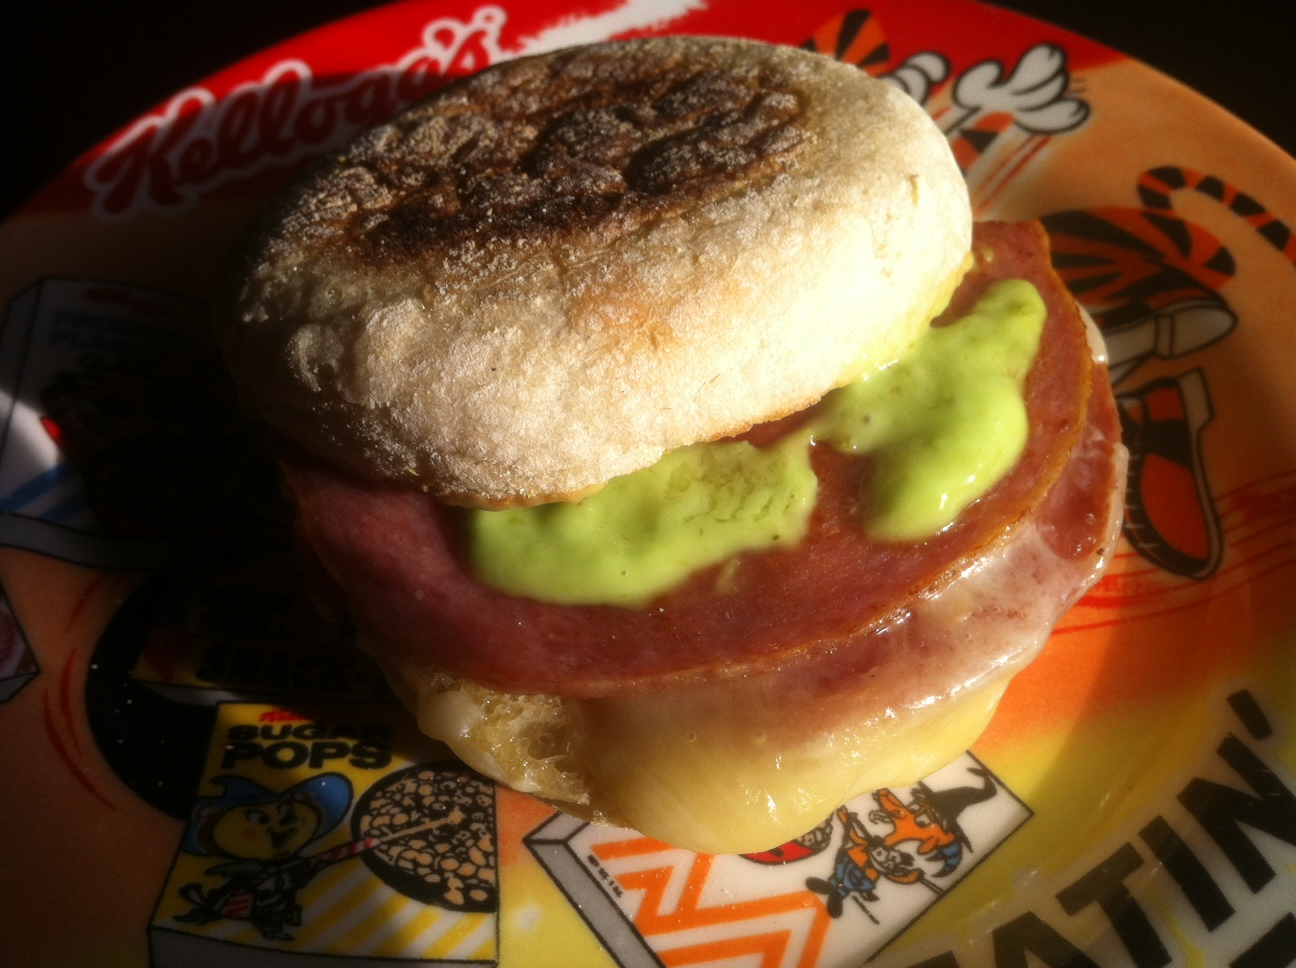 Pork Roll with Wasabi Sauce